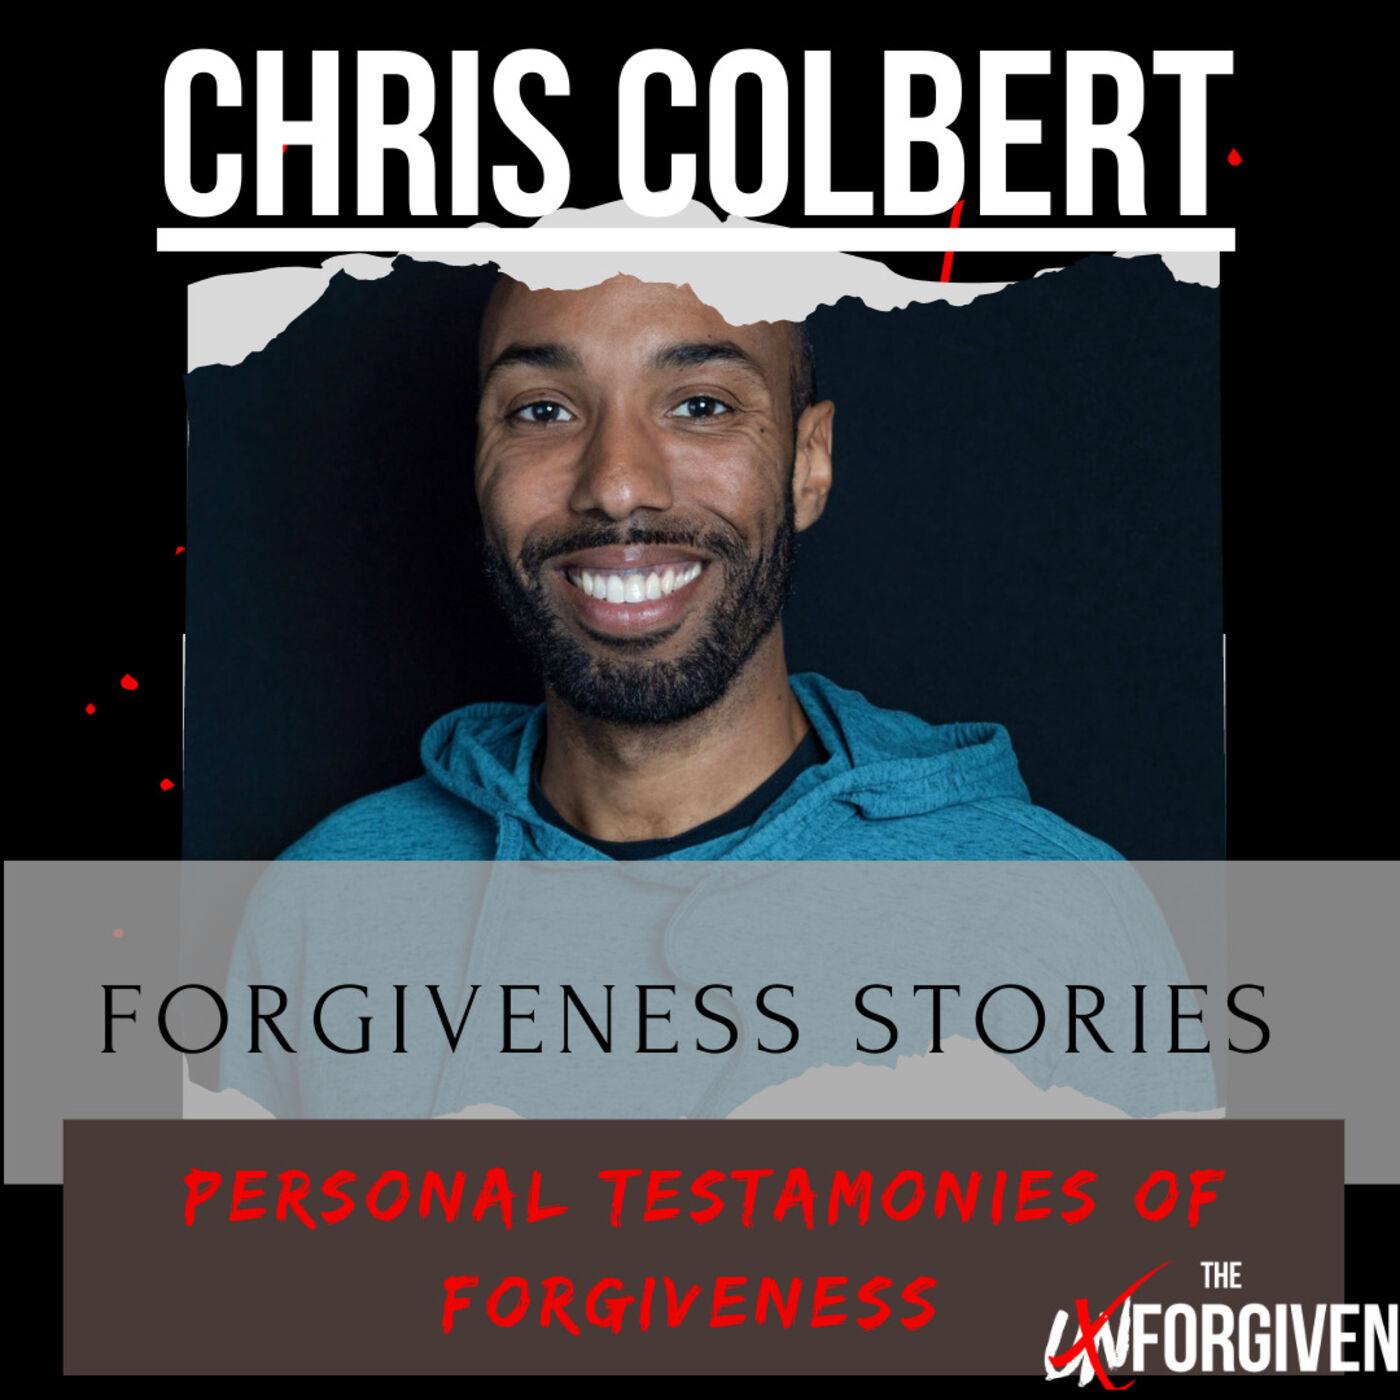 Forgiveness Story 1- Chris Colbert